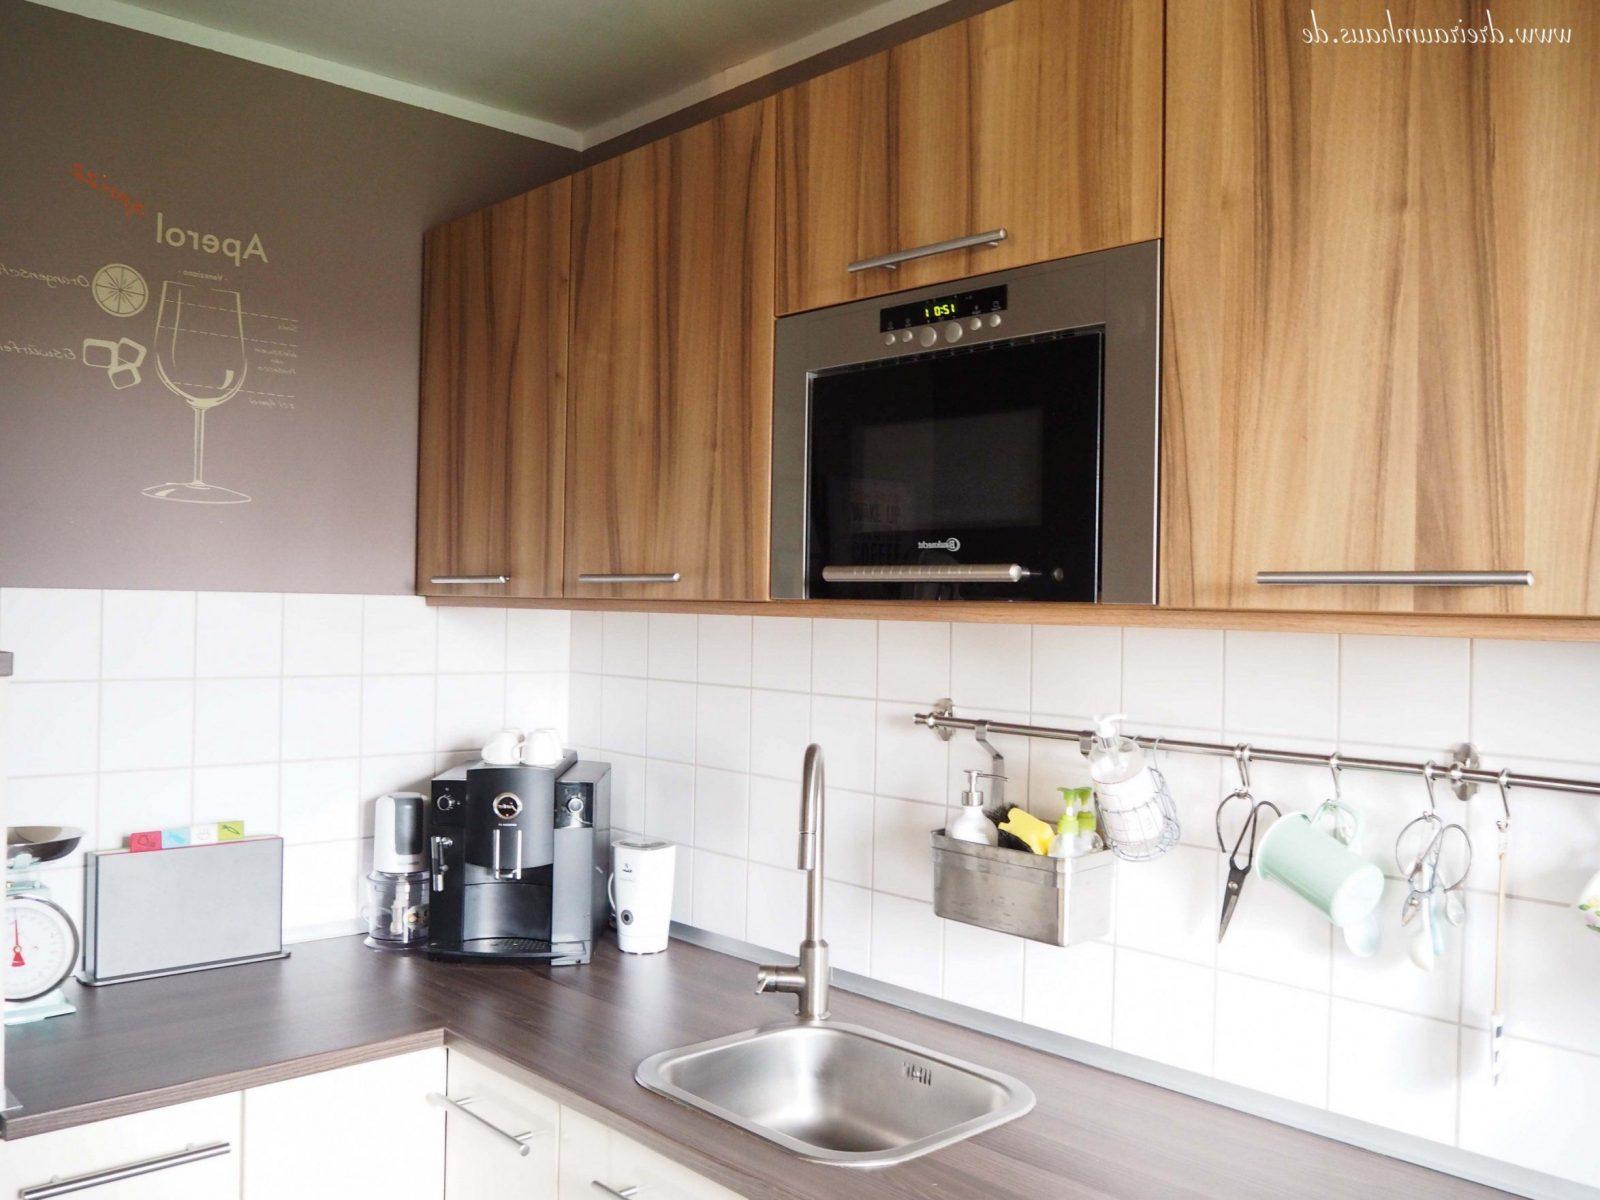 faktum und metod kombinieren haus design ideen. Black Bedroom Furniture Sets. Home Design Ideas